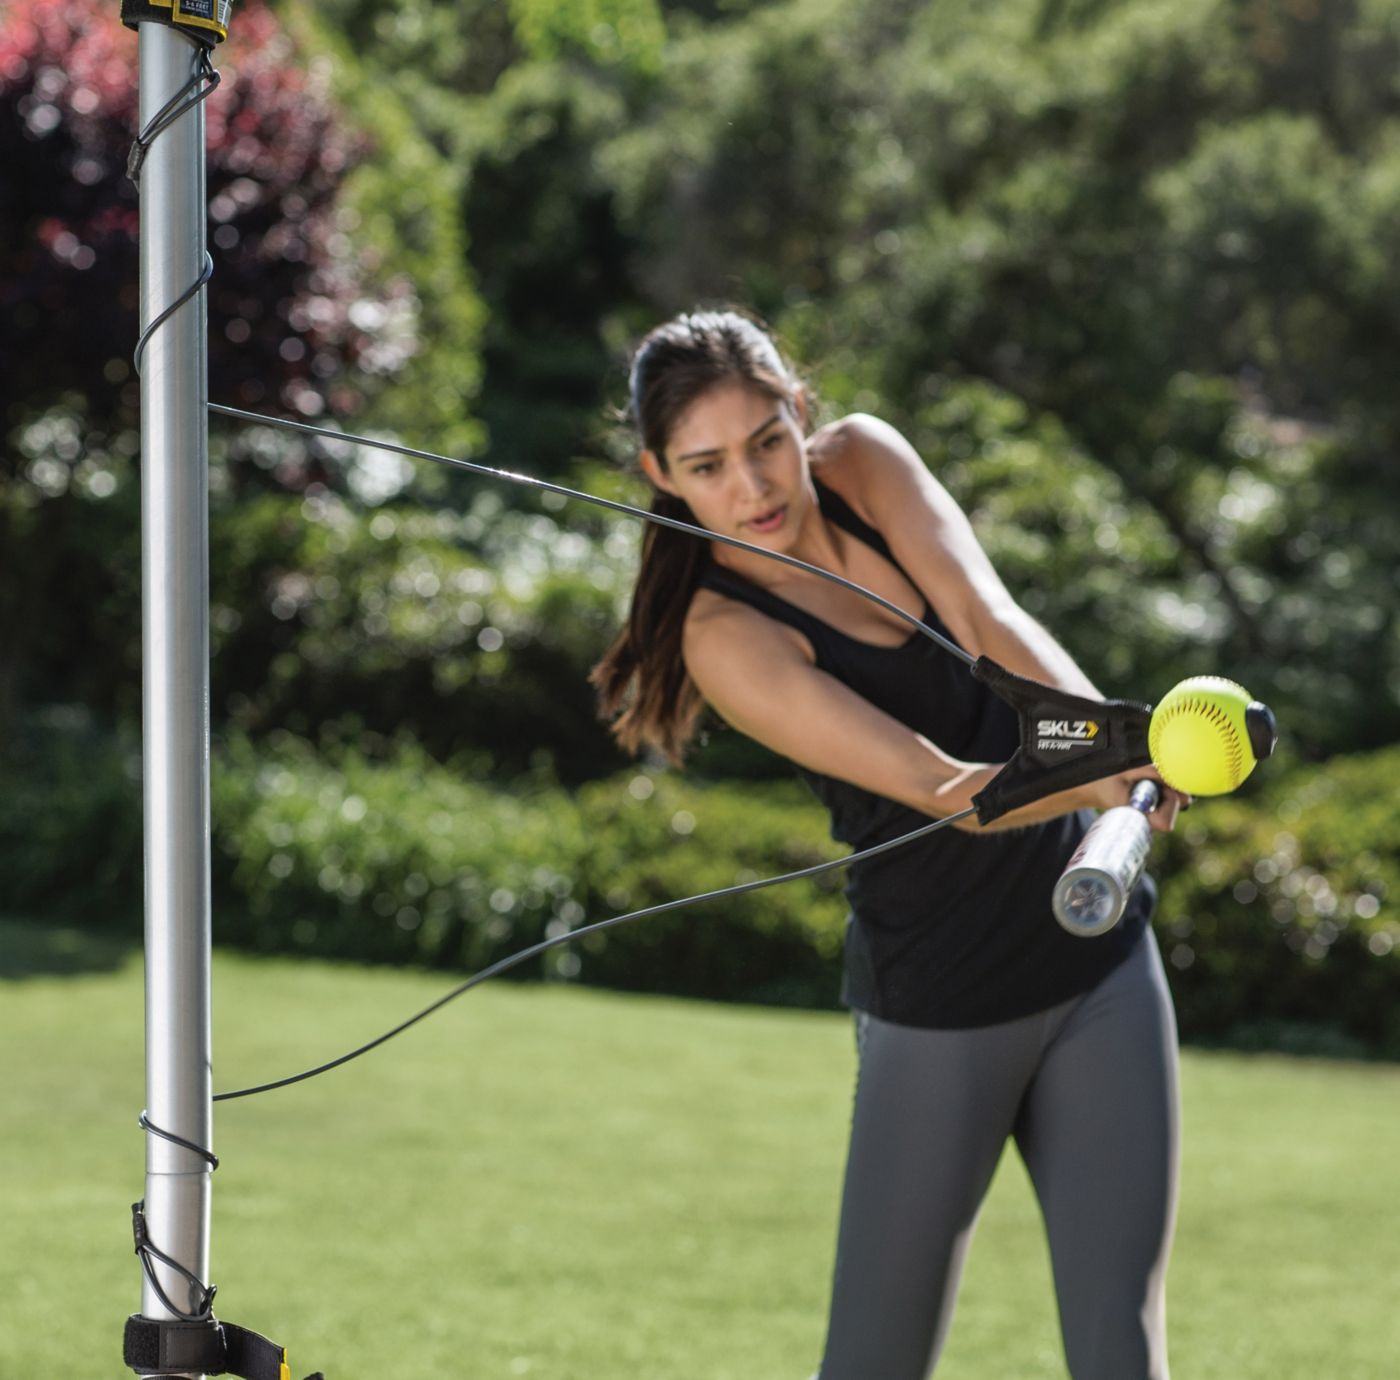 SKLZ Hit-A-Way Softball Swing Trainer